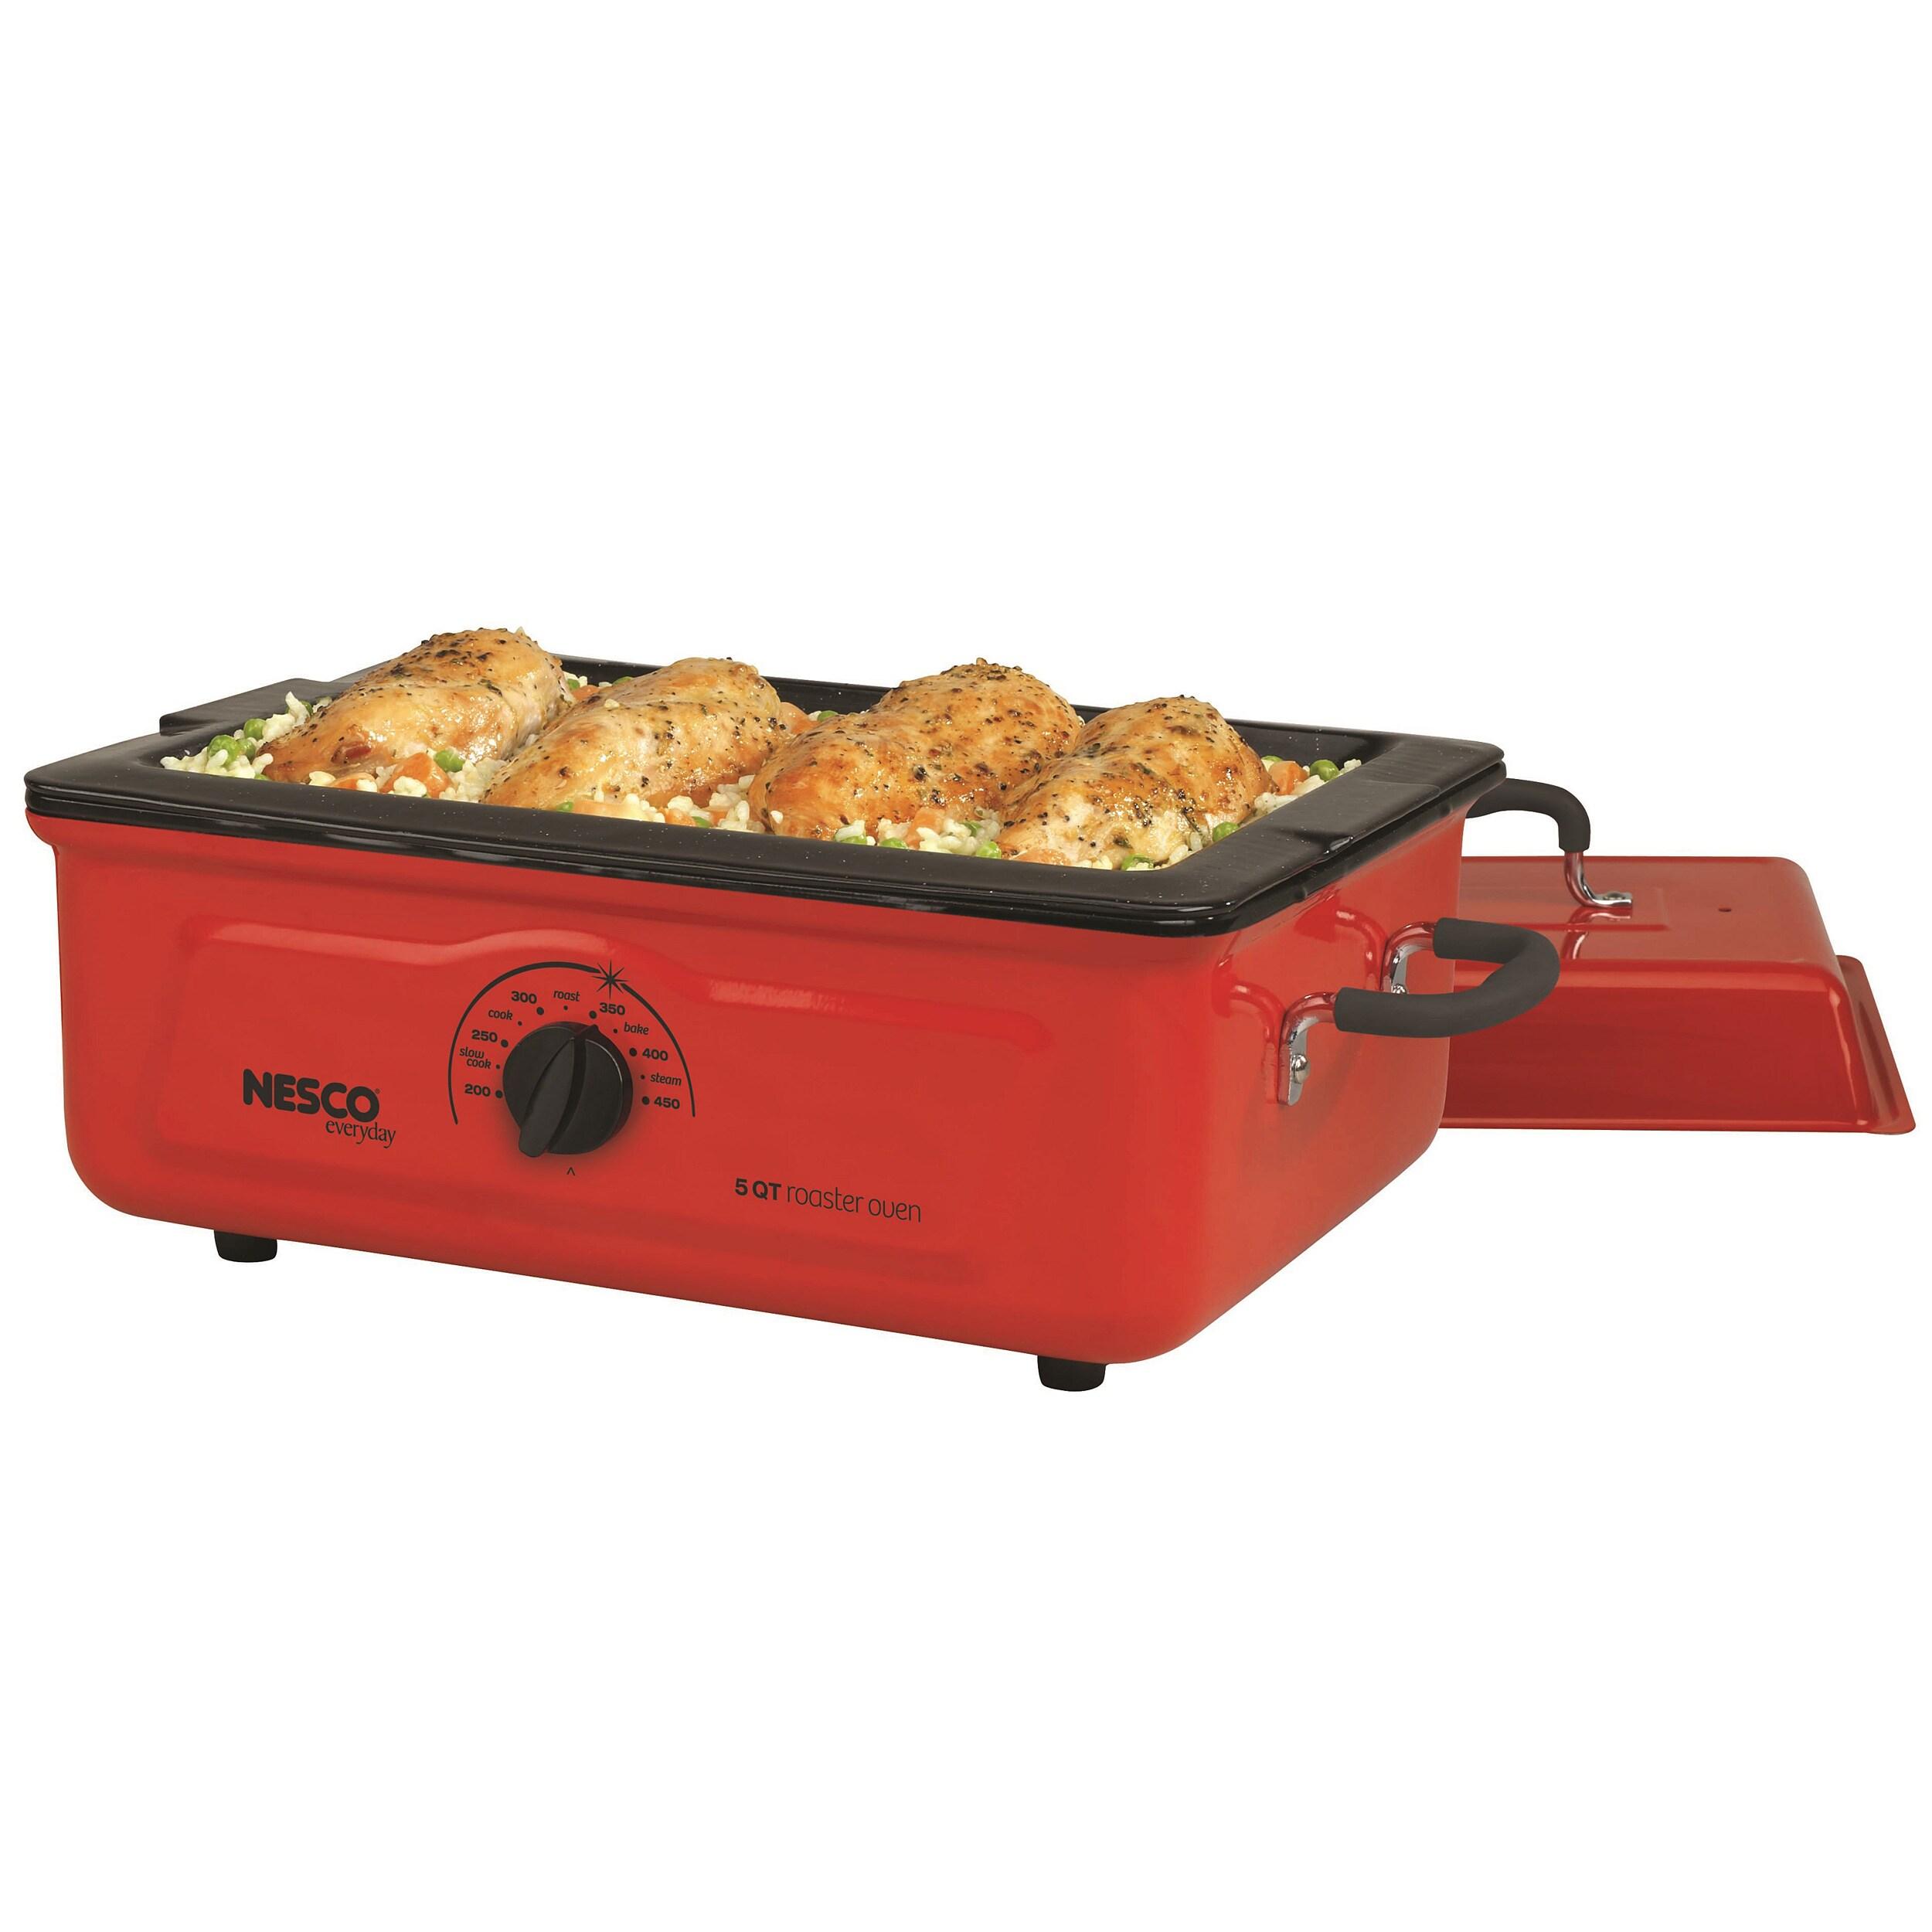 Nesco Cookwell Red 5-quart Porcelain Roaster Oven (Red), ...